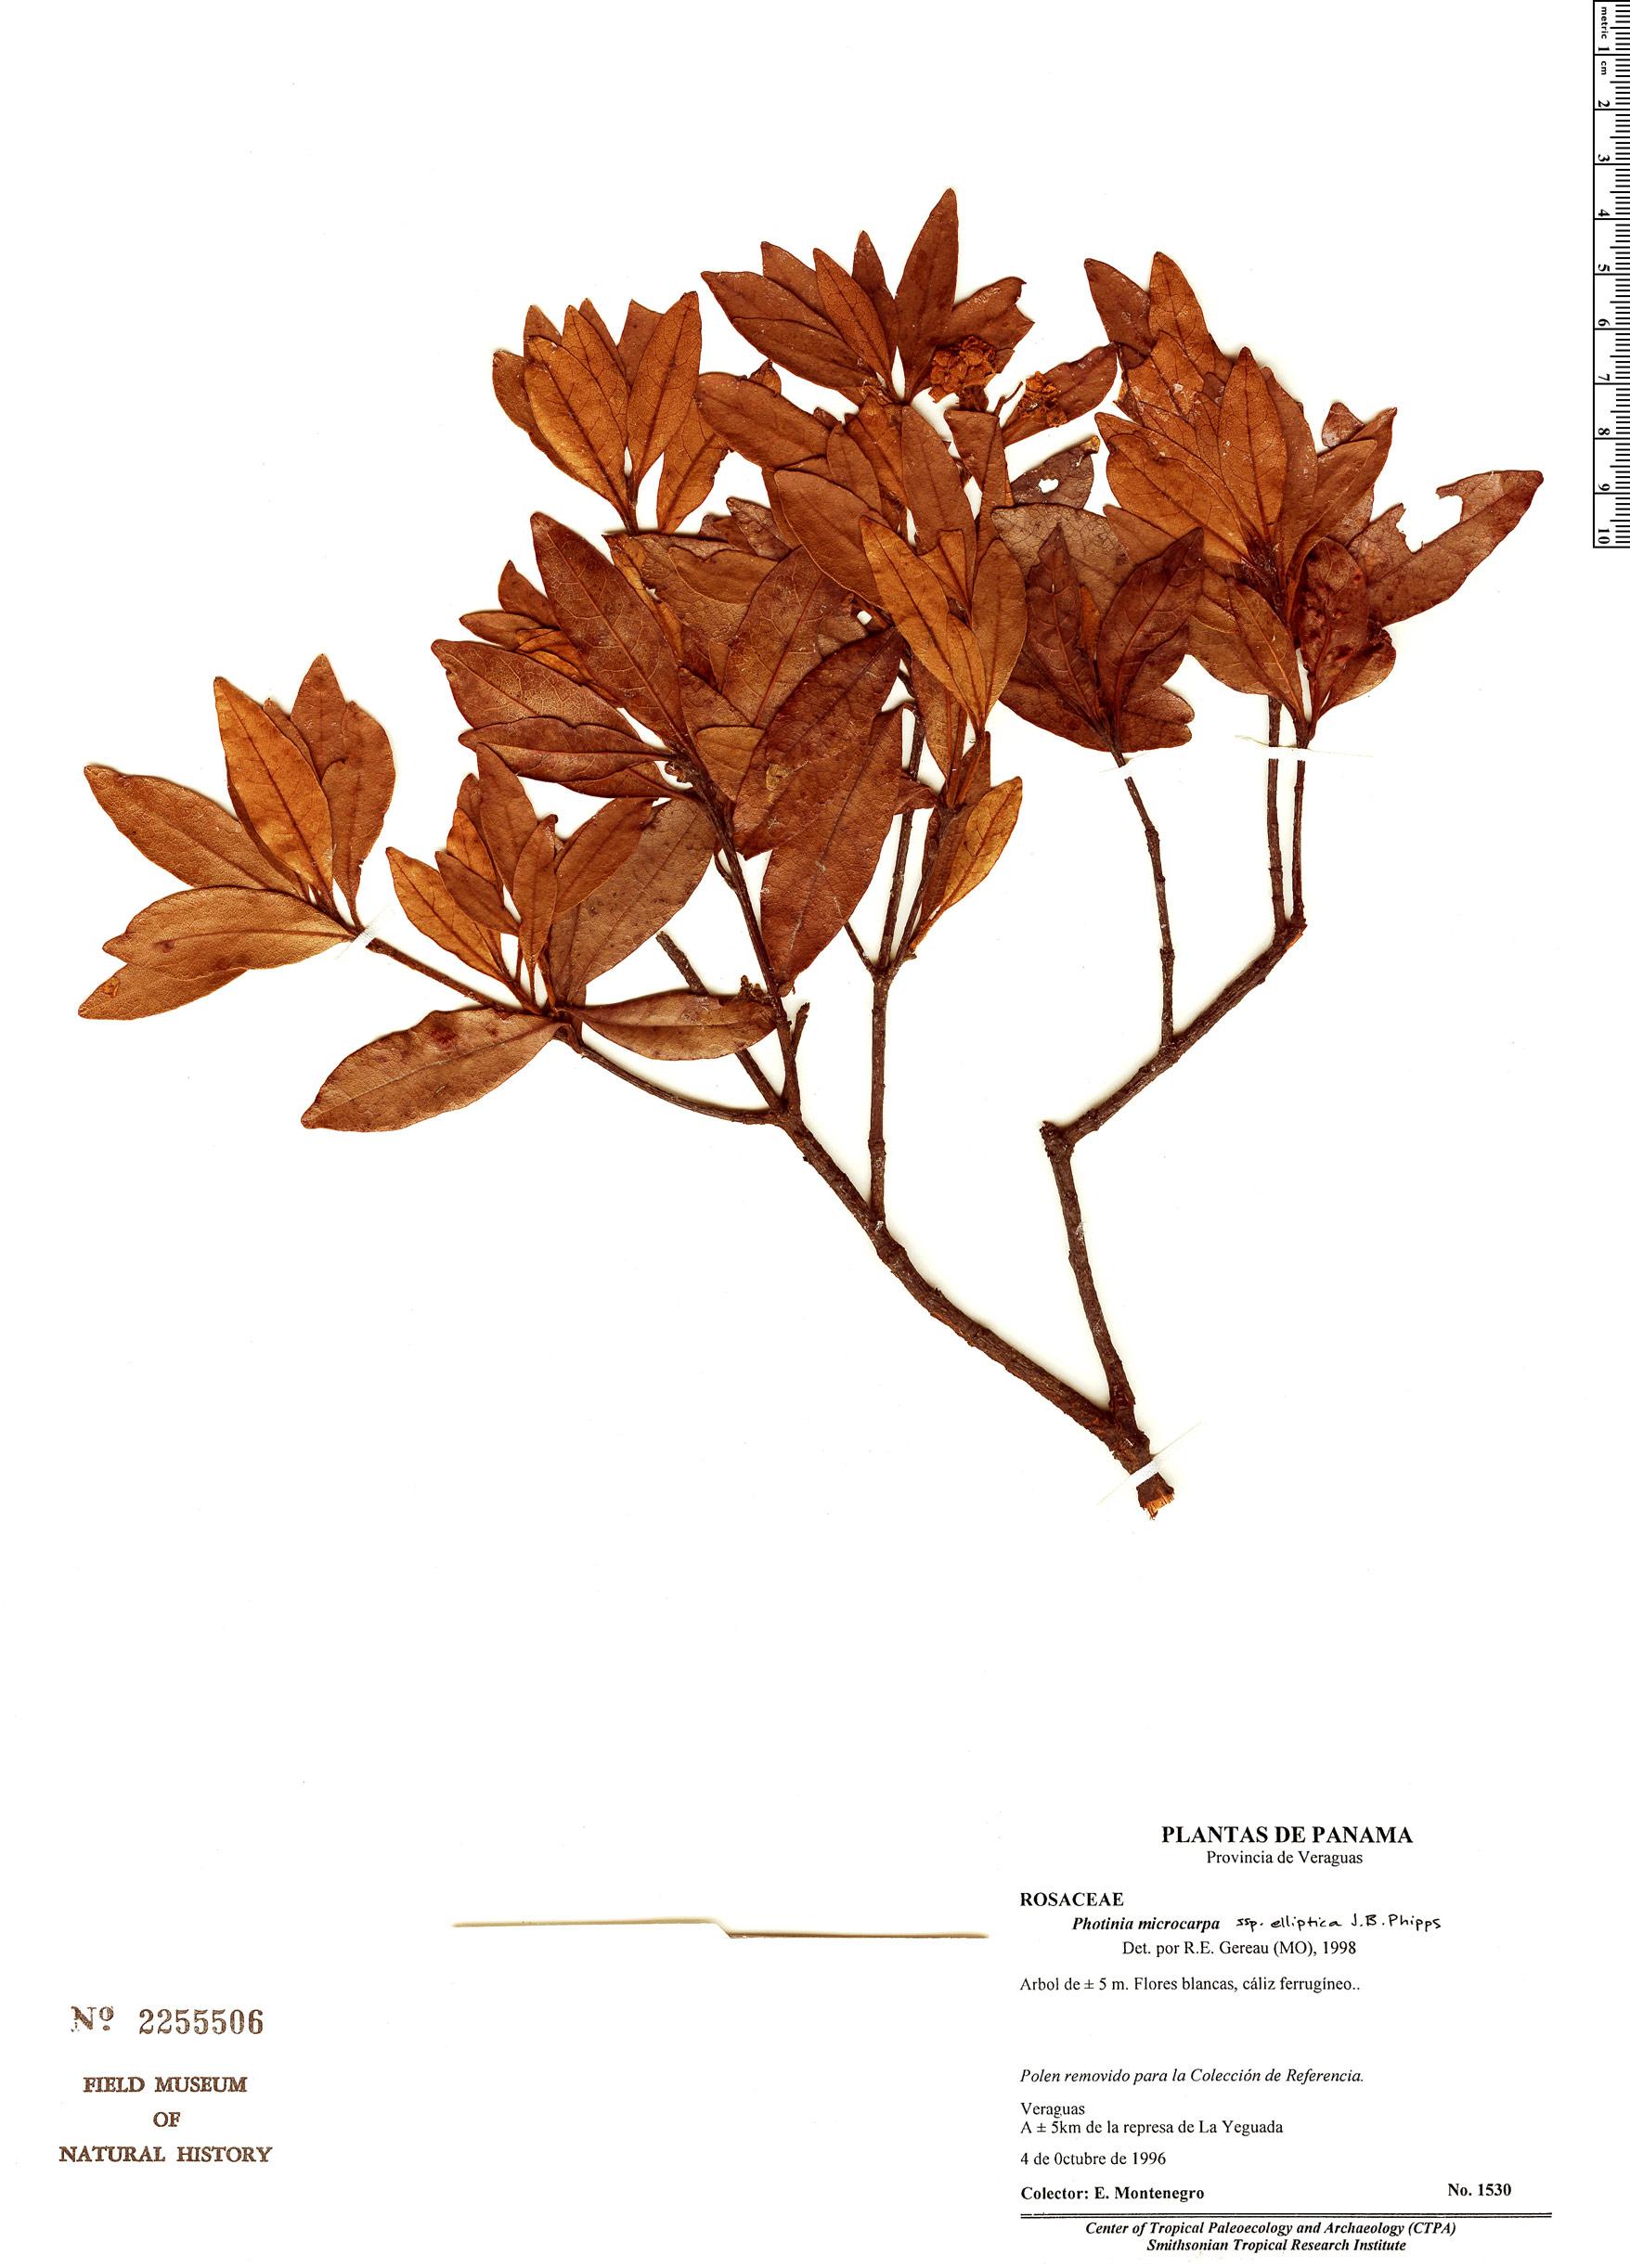 Specimen: Photinia microcarpa